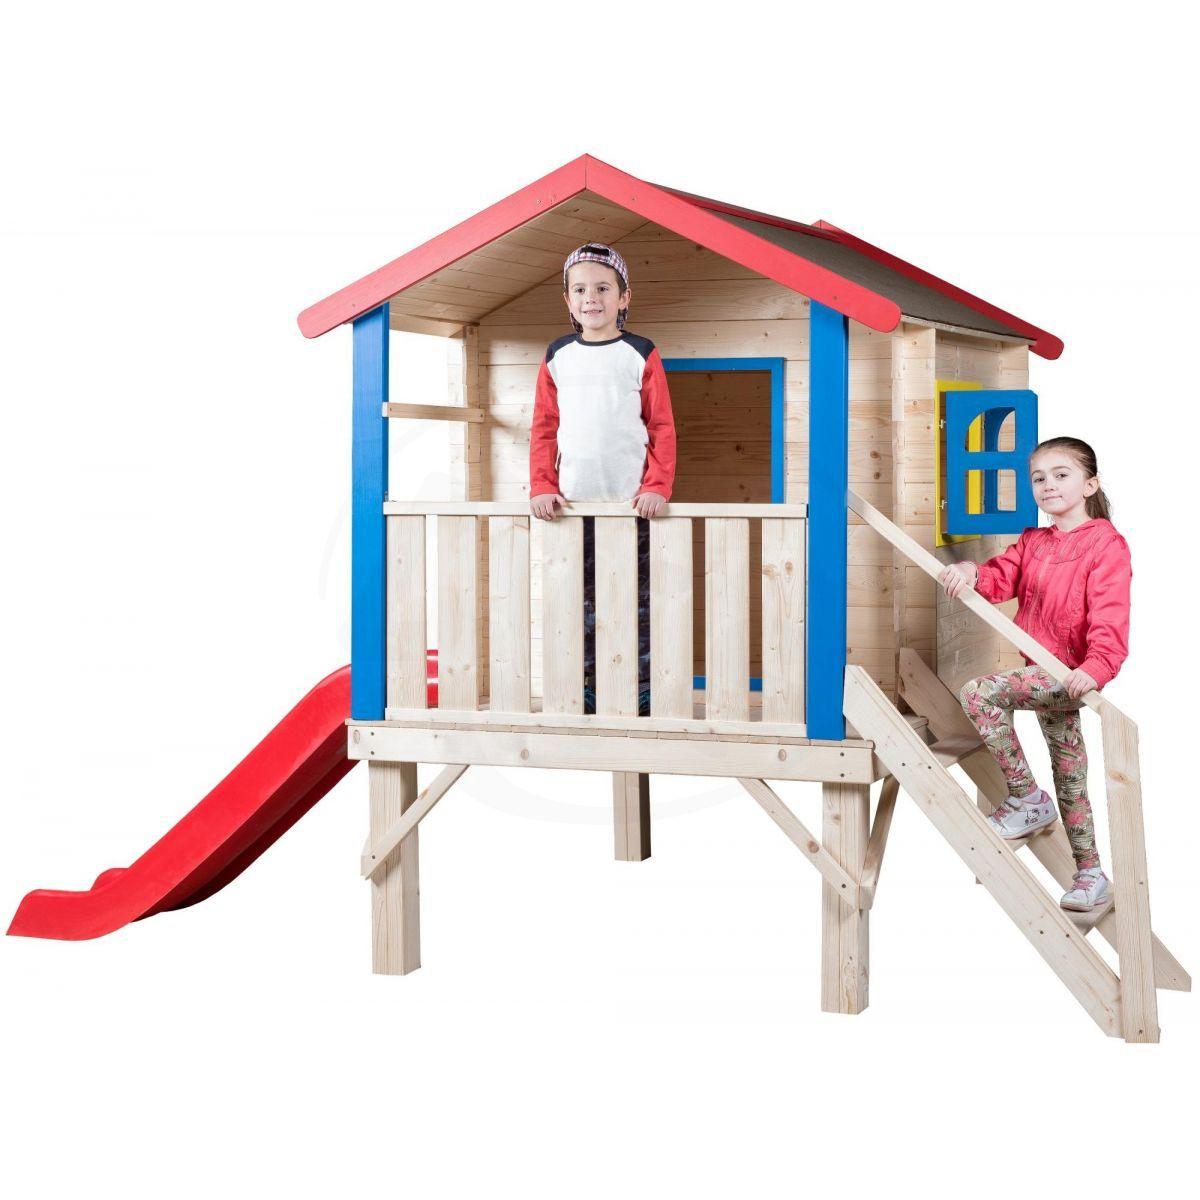 Woody Zahradní domek s podestou, zábradlím a klouzačkou